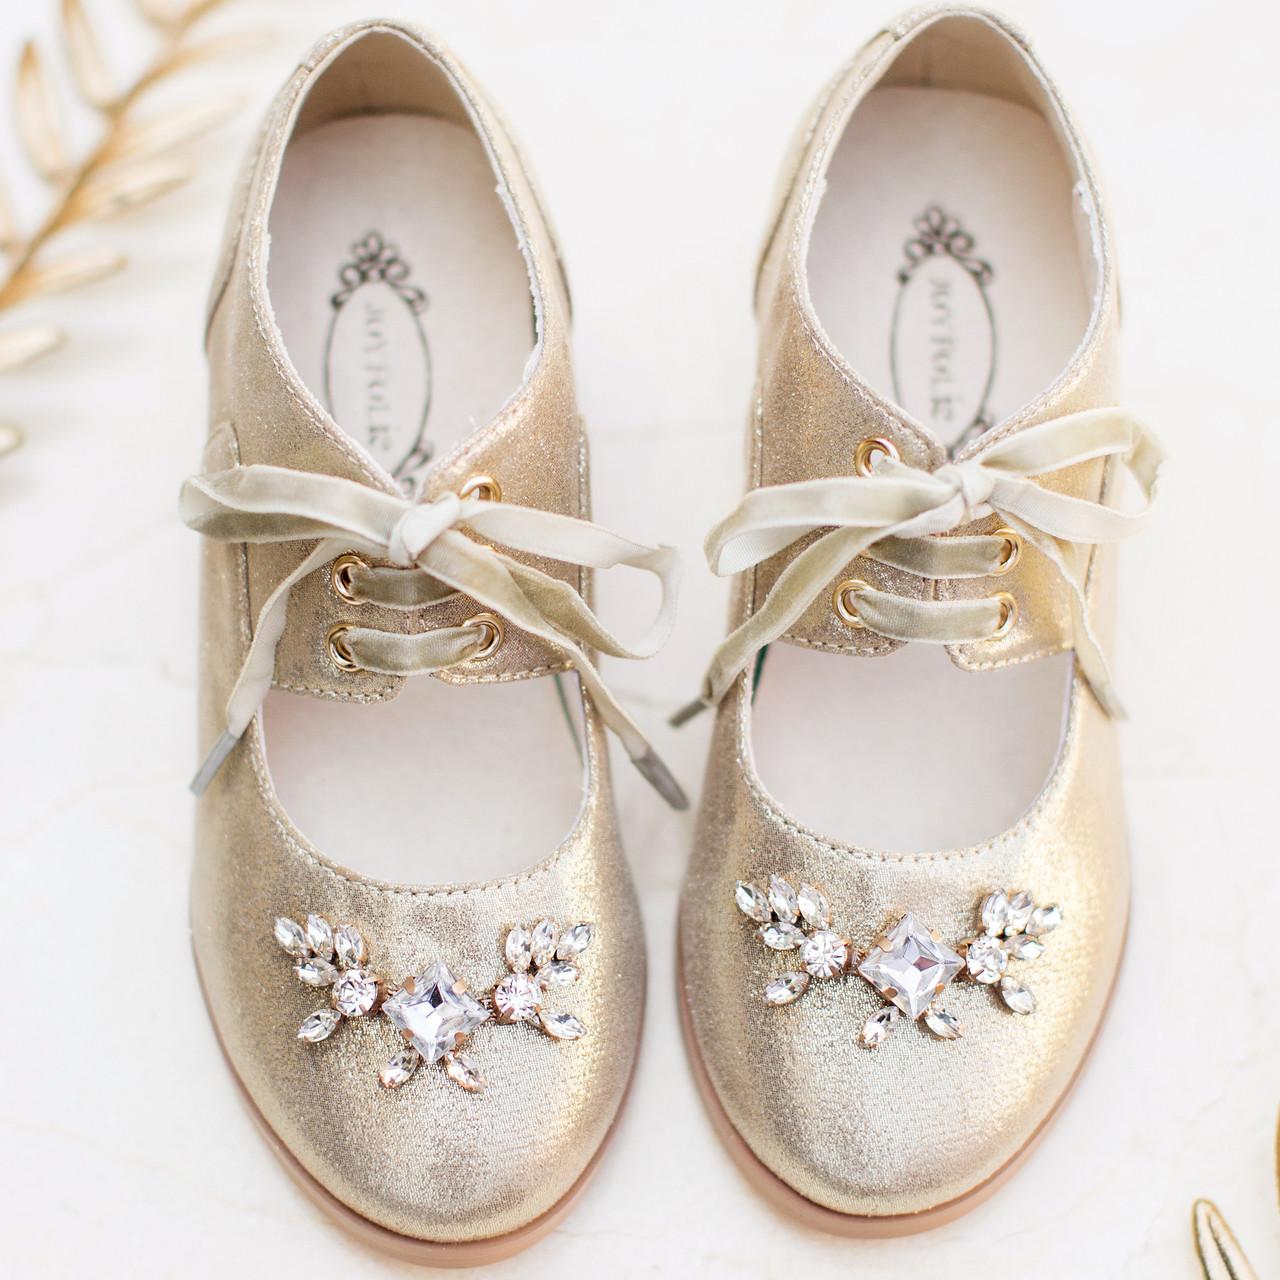 f42119c54331 Joyfolie wren boots blush bow jpg 1280x1280 Joyfolie gladiator sandals